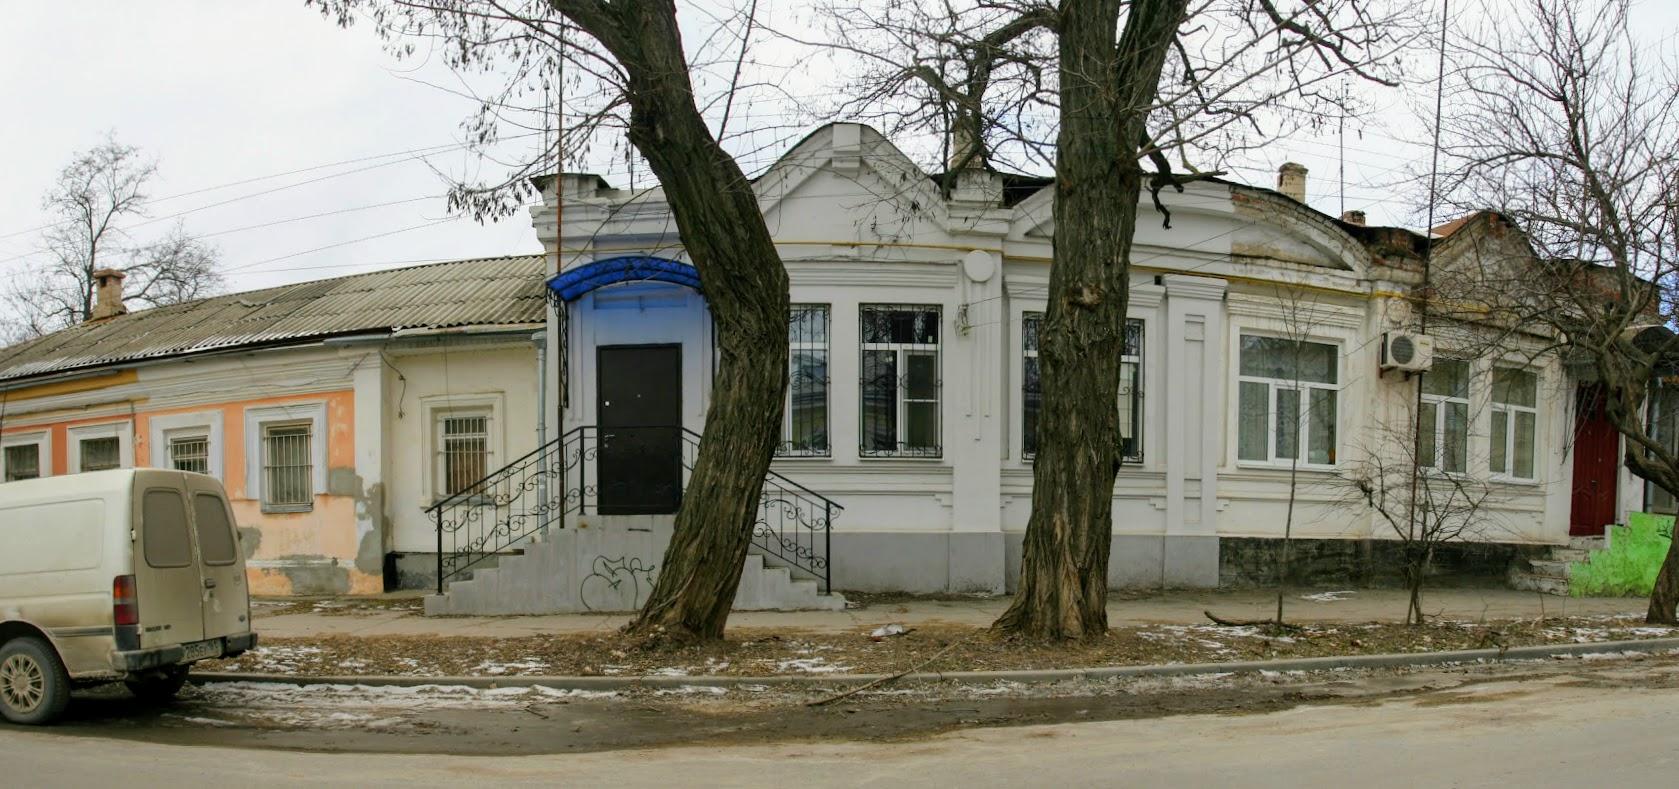 https://sites.google.com/site/istoriceskijtaganrog/dobrolubovskij-pereulok/dom-20